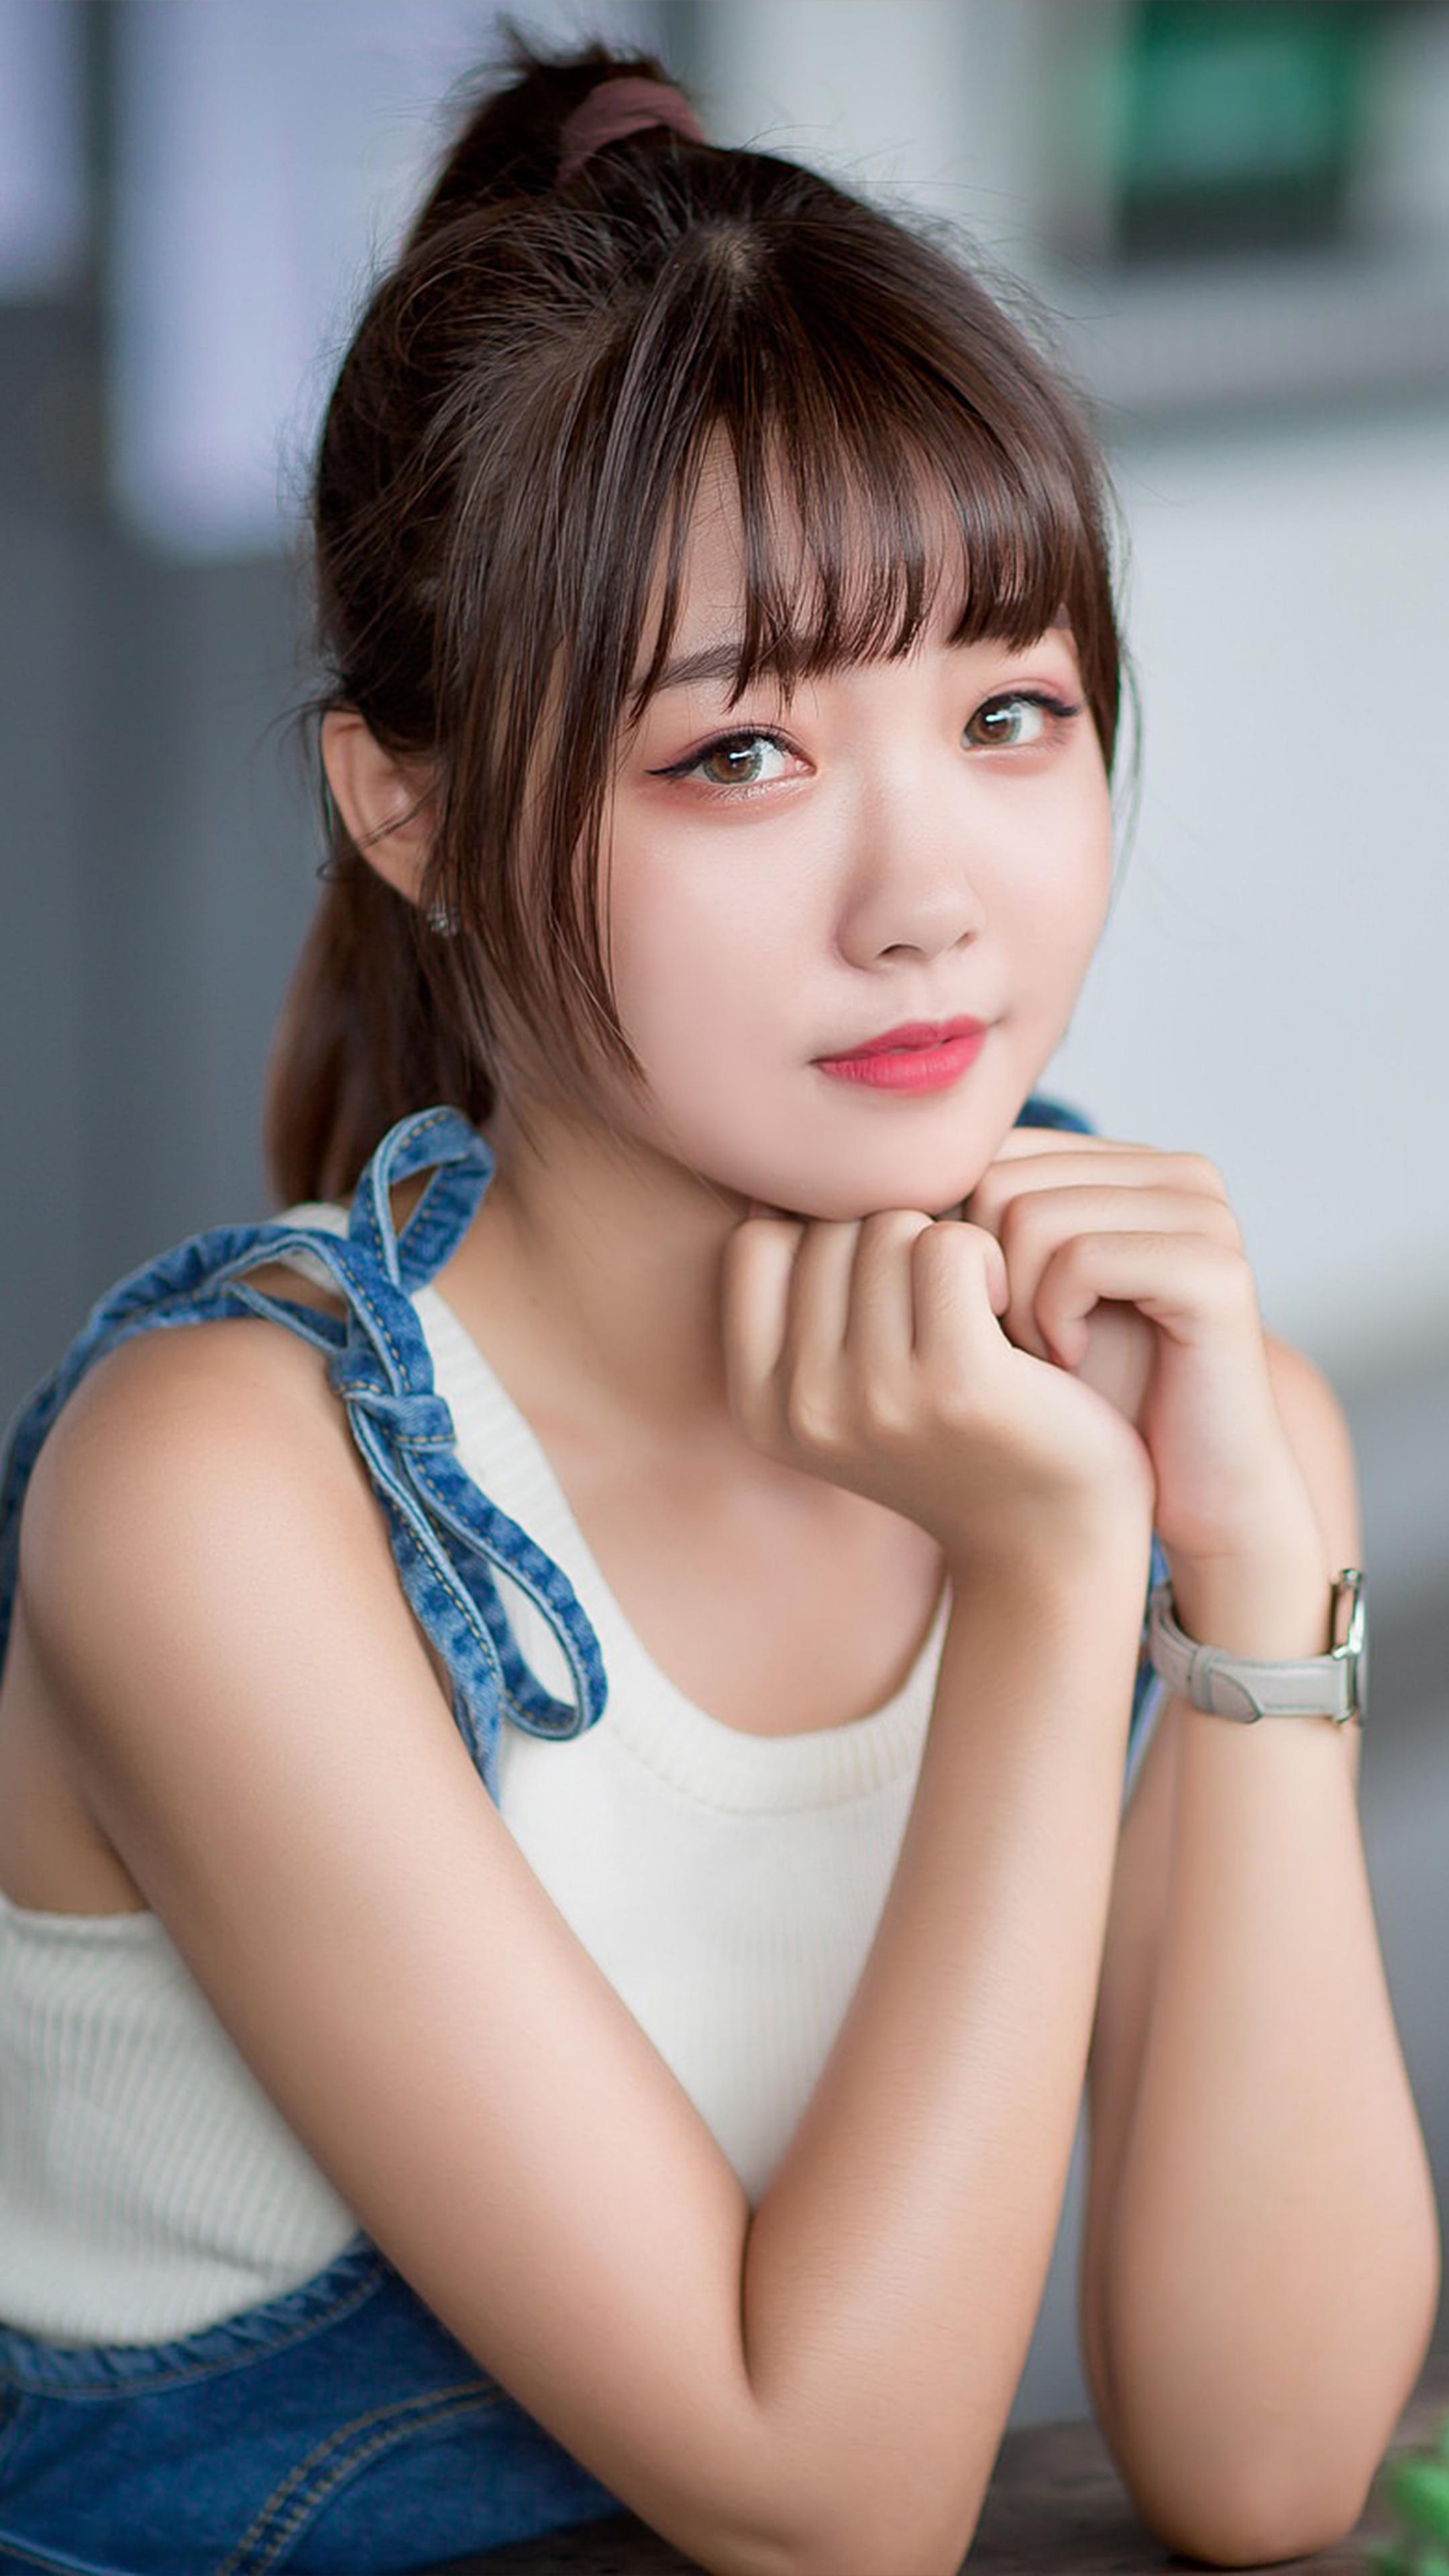 Cute Adorable Asian Girl Photography 4k Ultra Hd Mobile Wallpaper